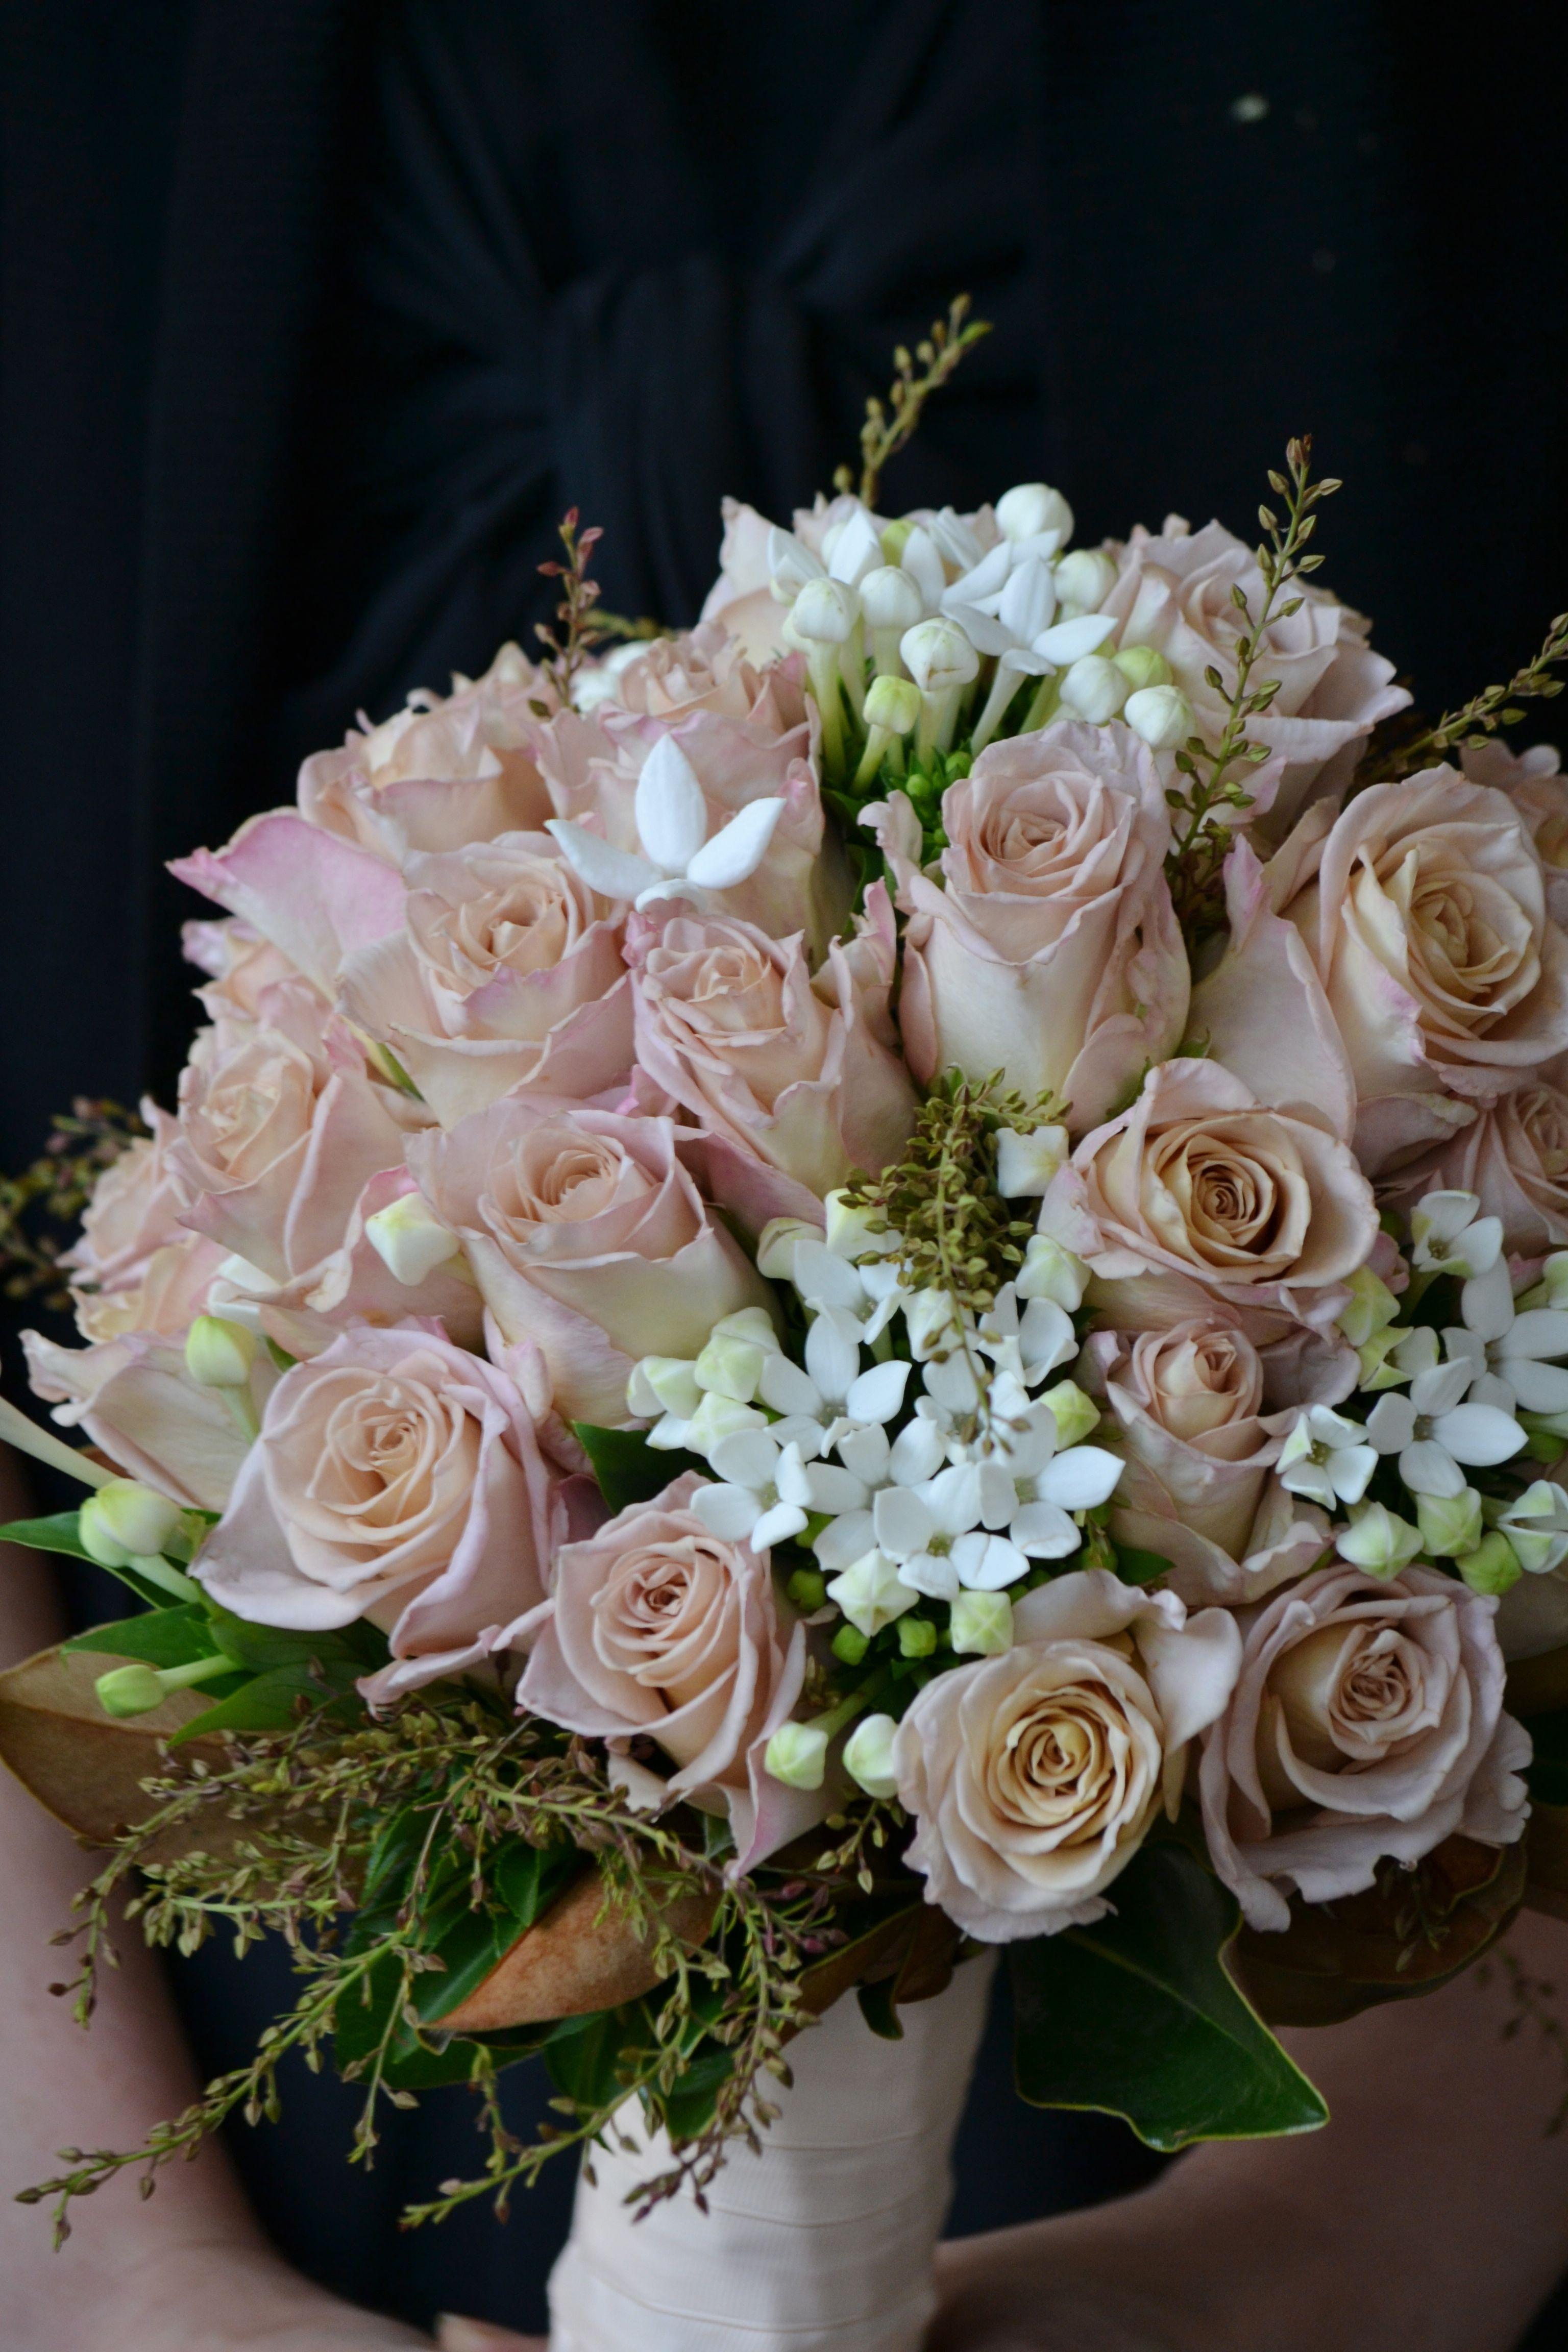 august wedding bouquets photo - 1